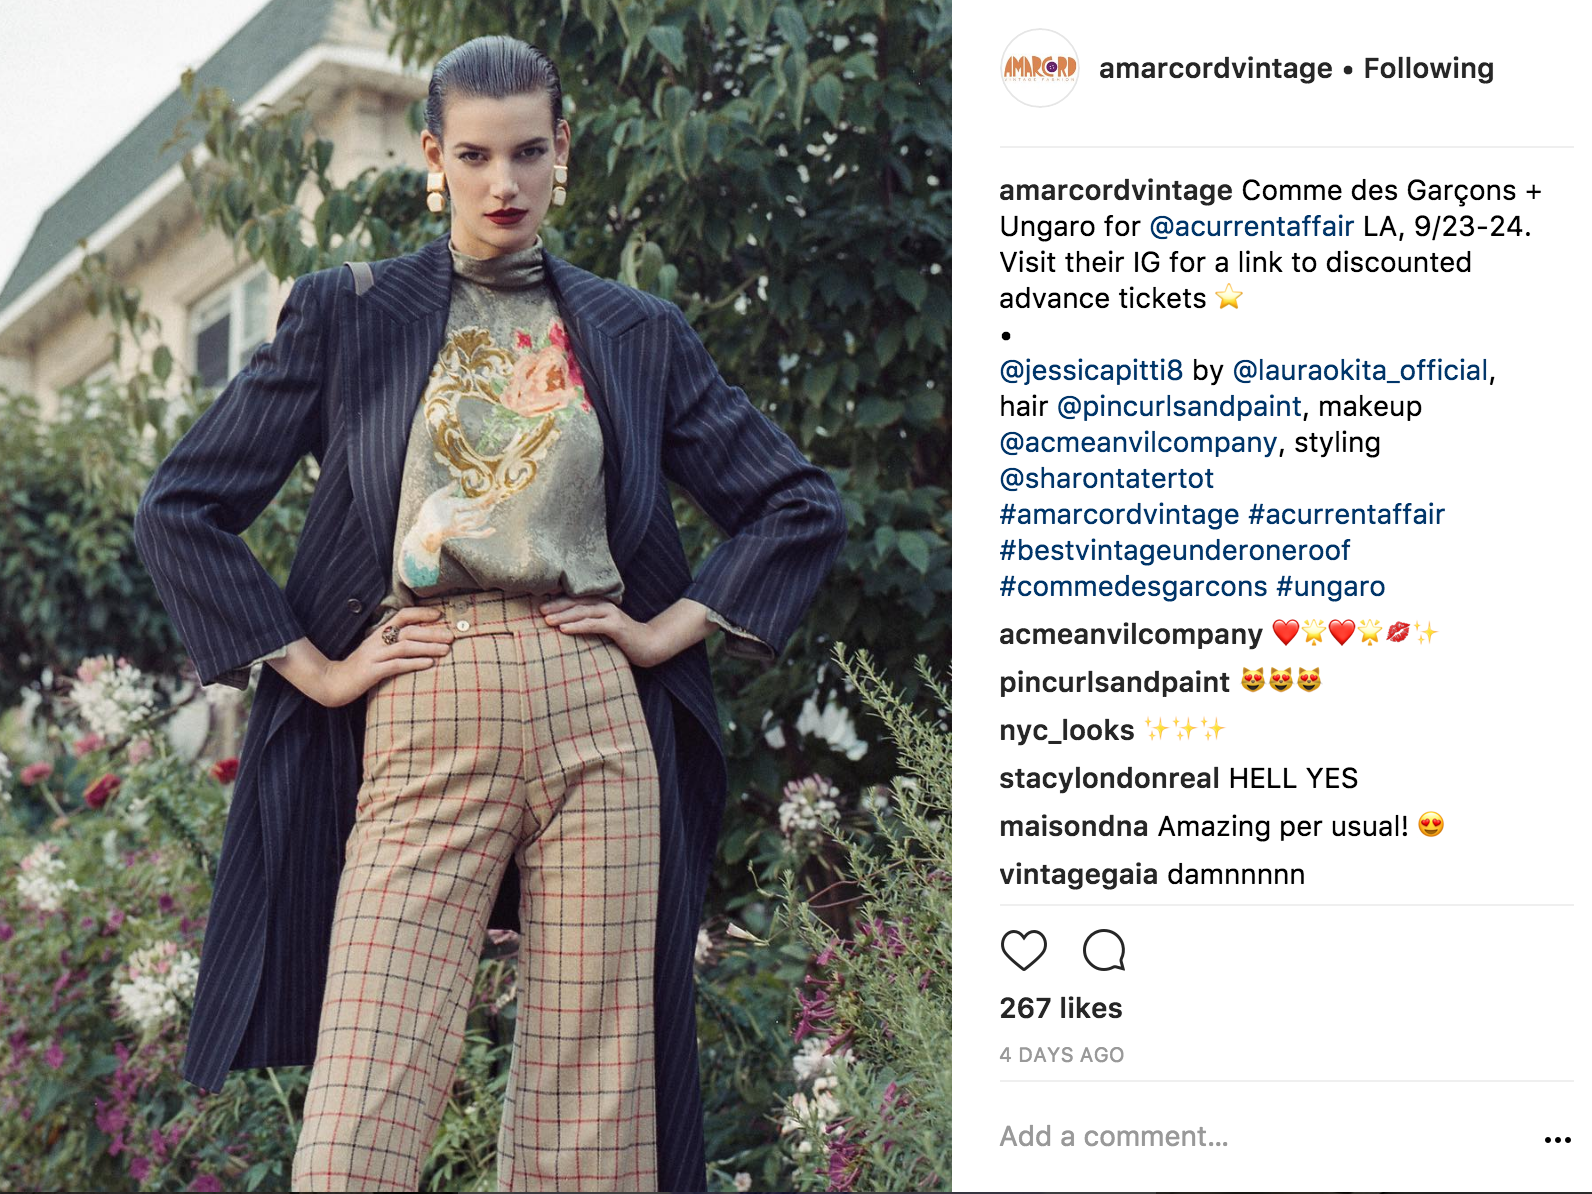 Amarcord Vintage instagram